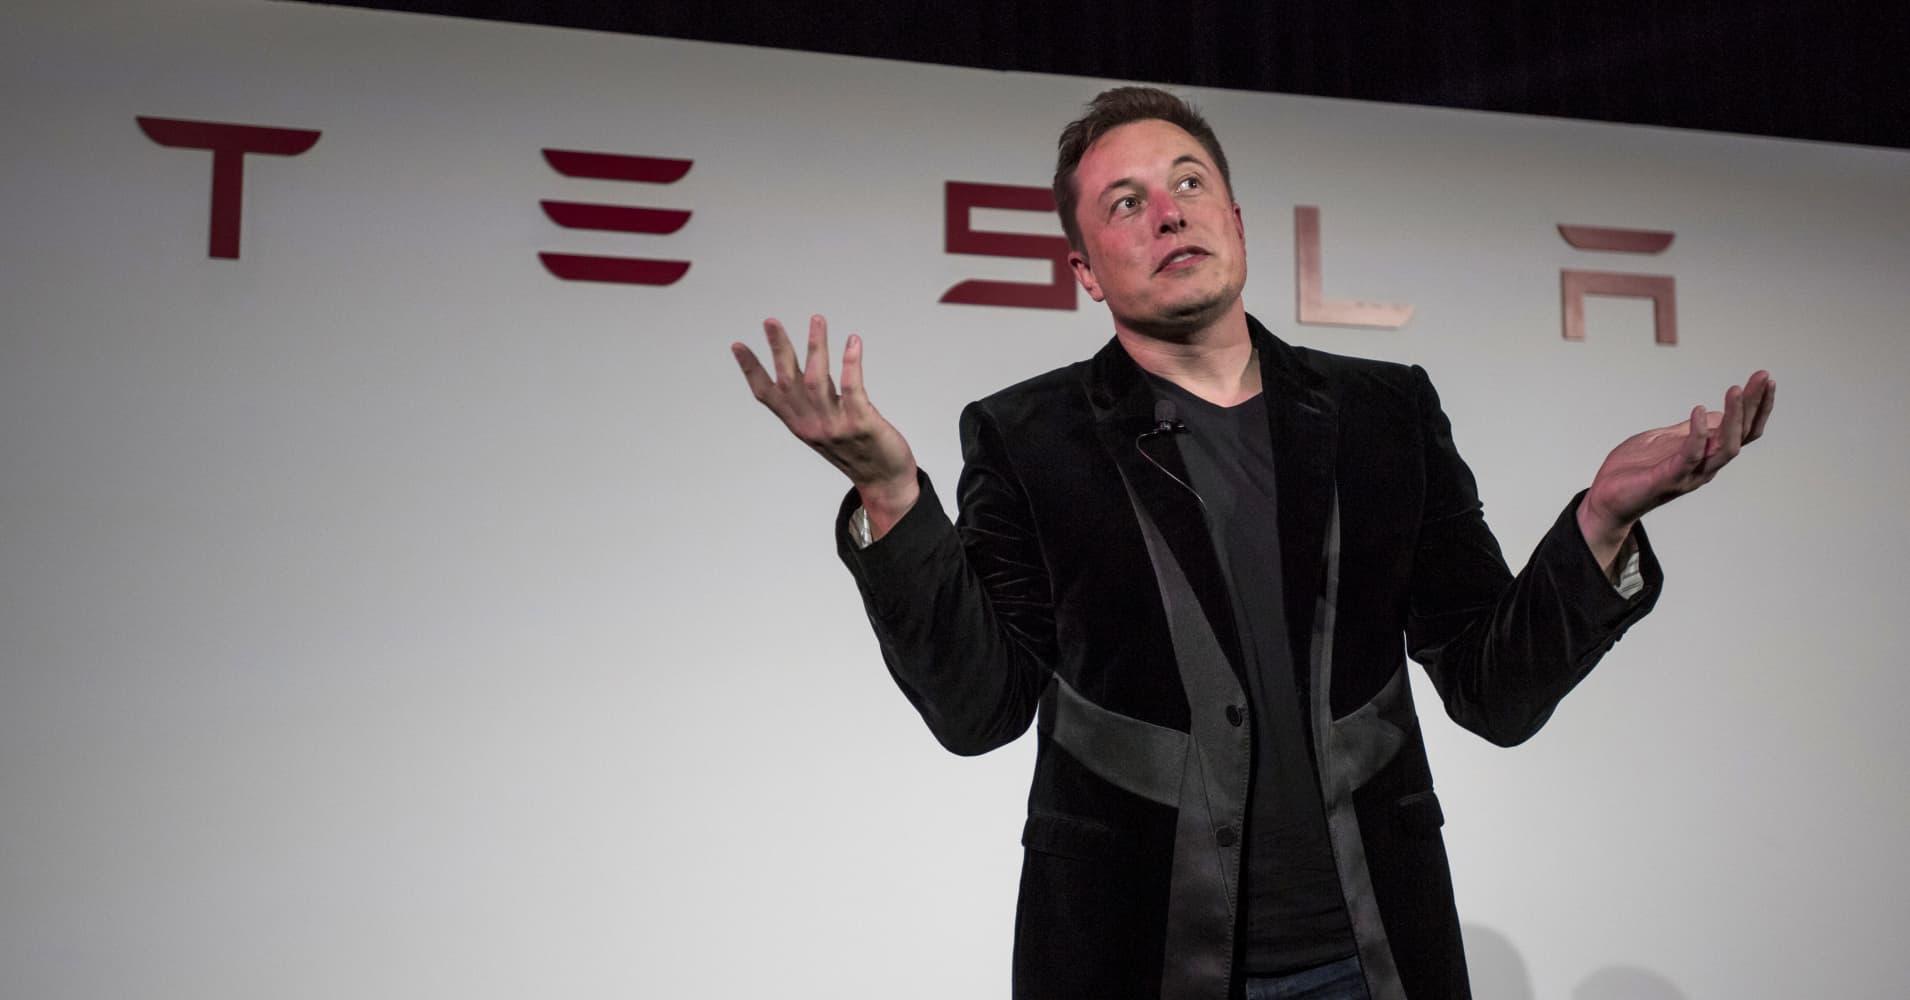 Elon Musk, chairman and chief executive officer of Tesla Motors Inc.